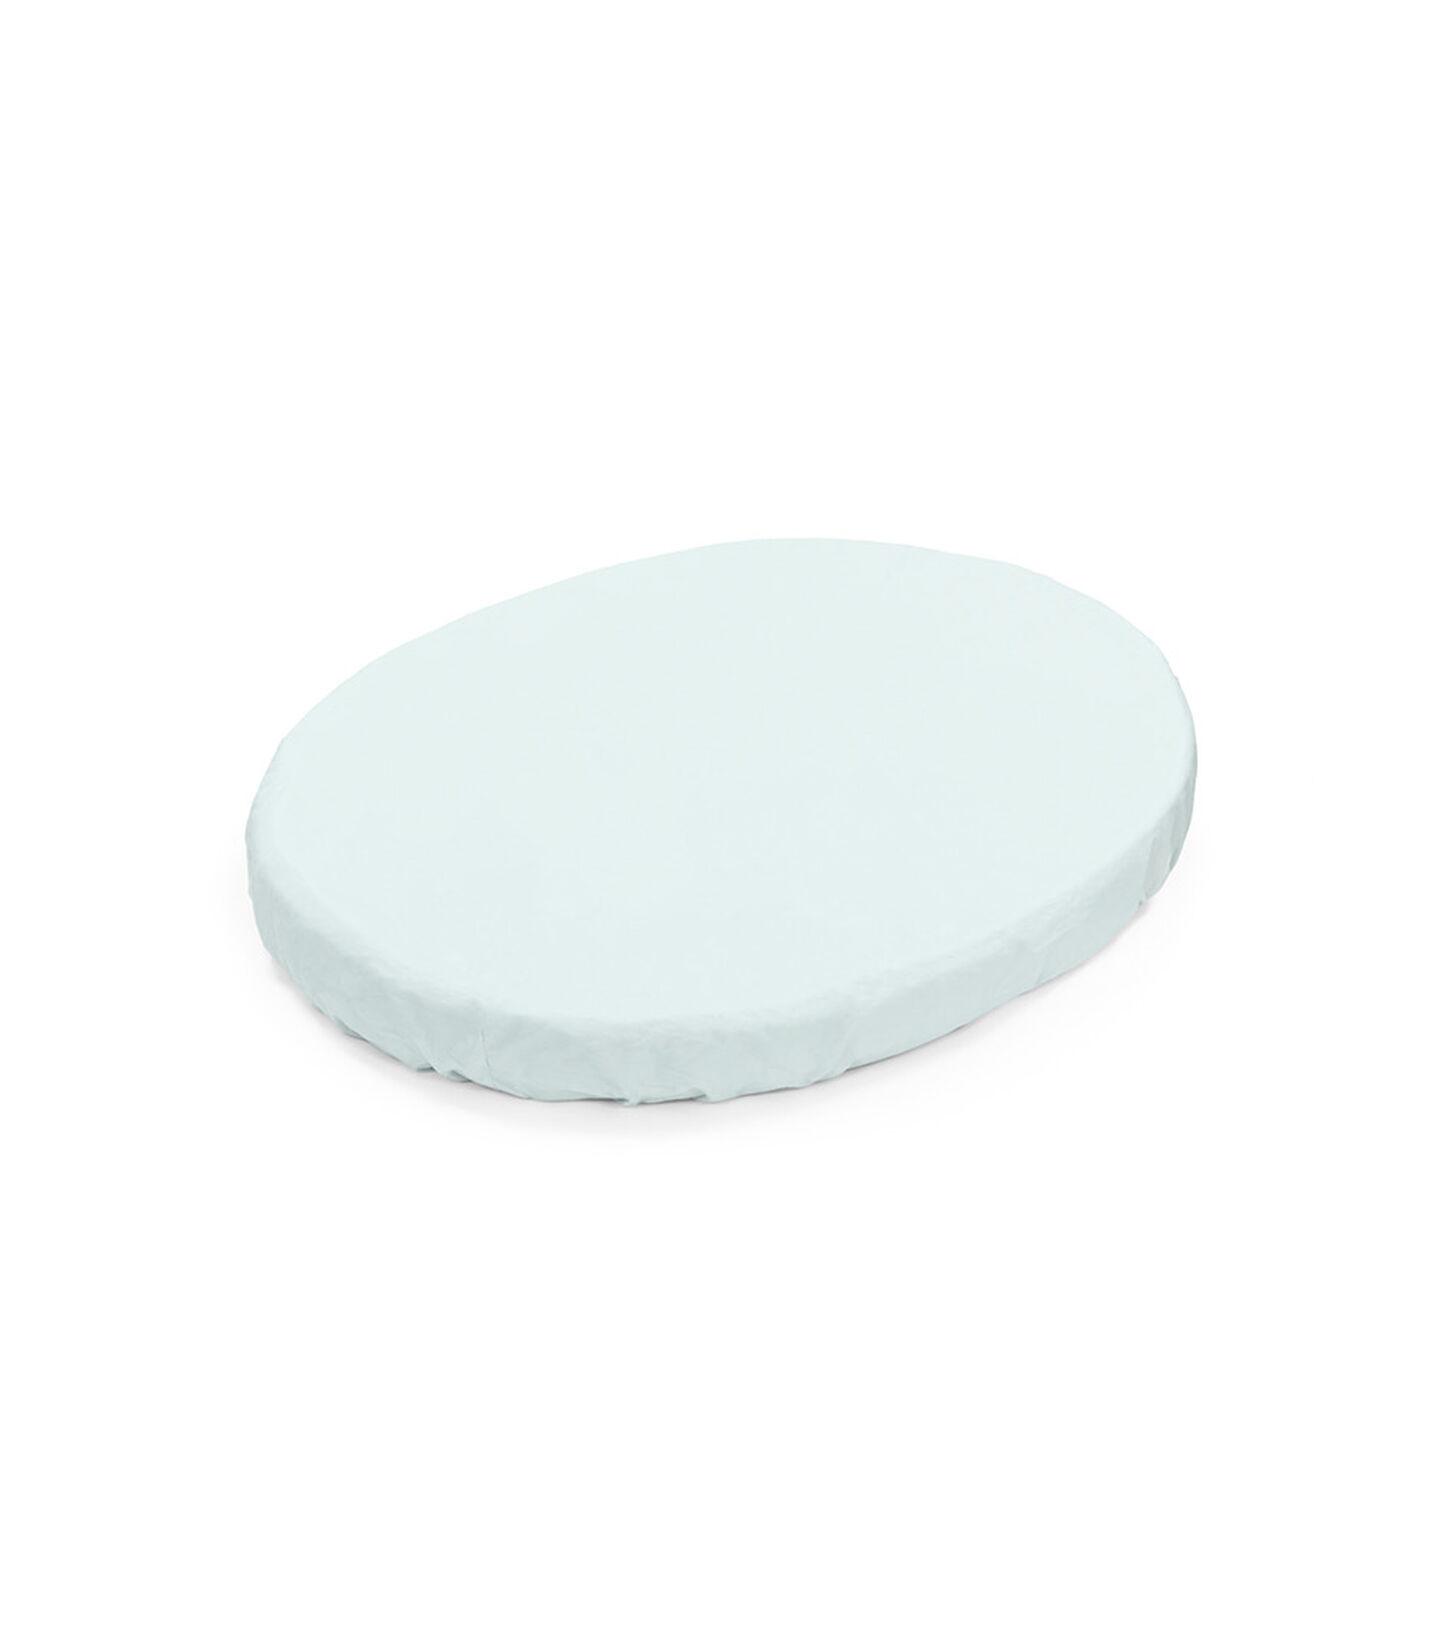 Stokke® Sleepi™ Mini Spannbettlaken Powder Blue, Powder Blue, mainview view 1